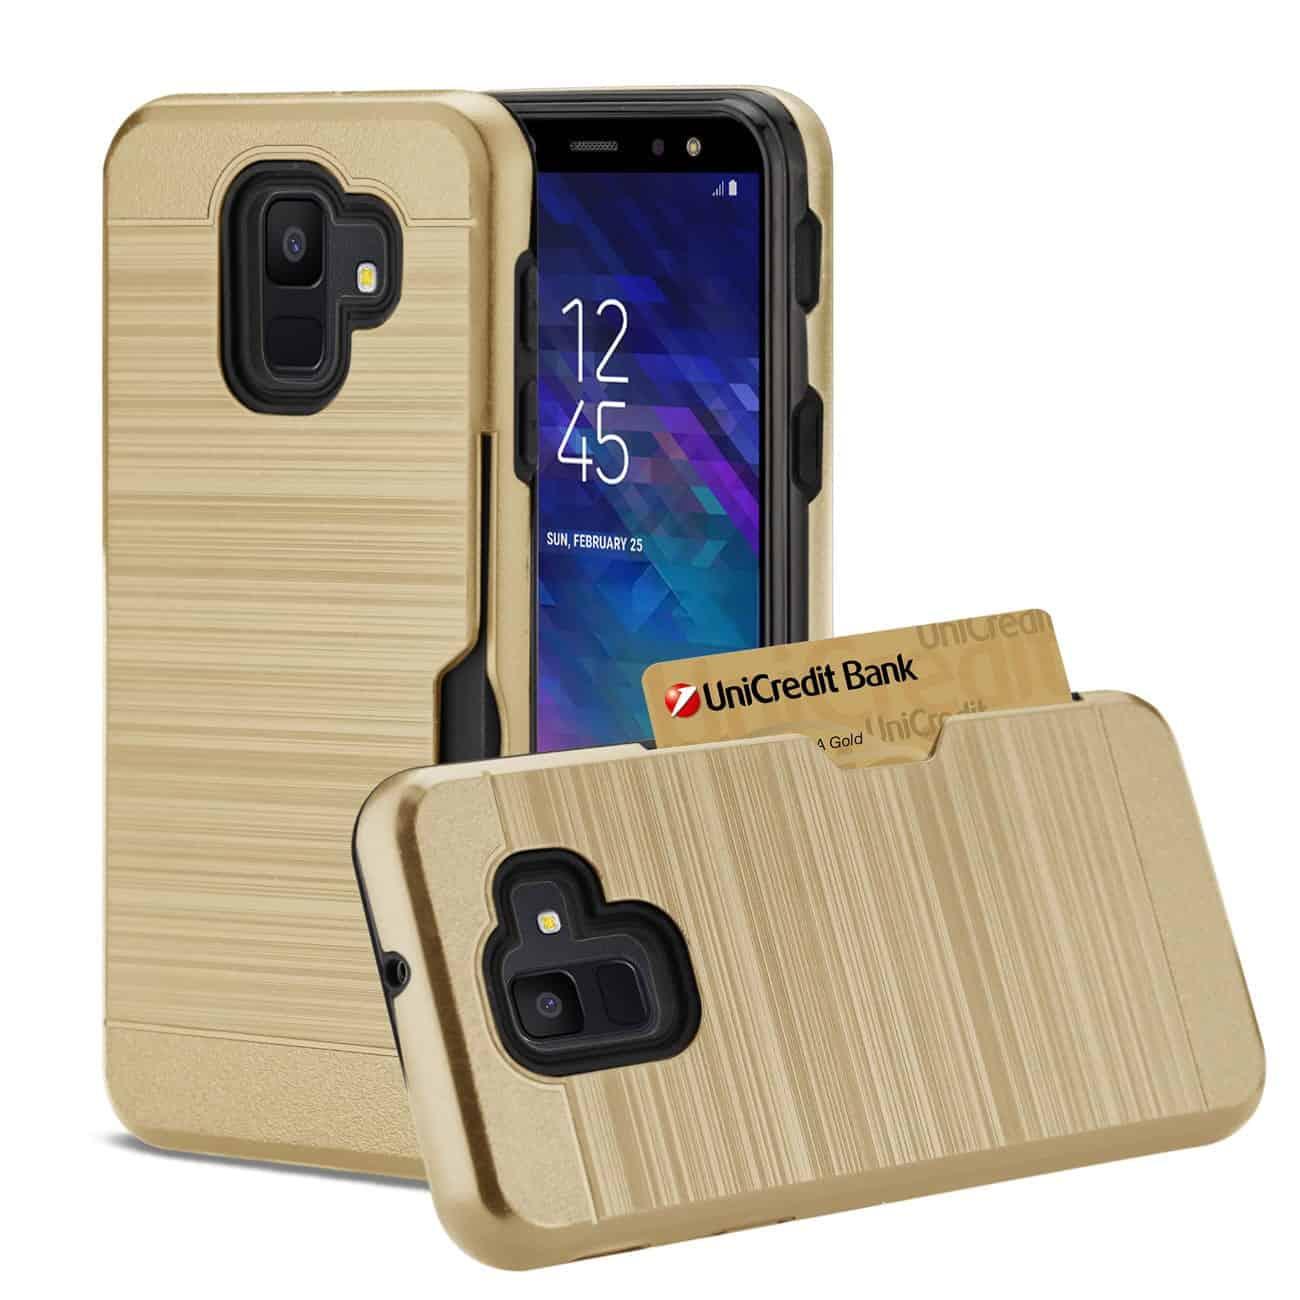 Samsung Galaxy A6 Slim Armor Hybrid Case With Card Holder In Gold